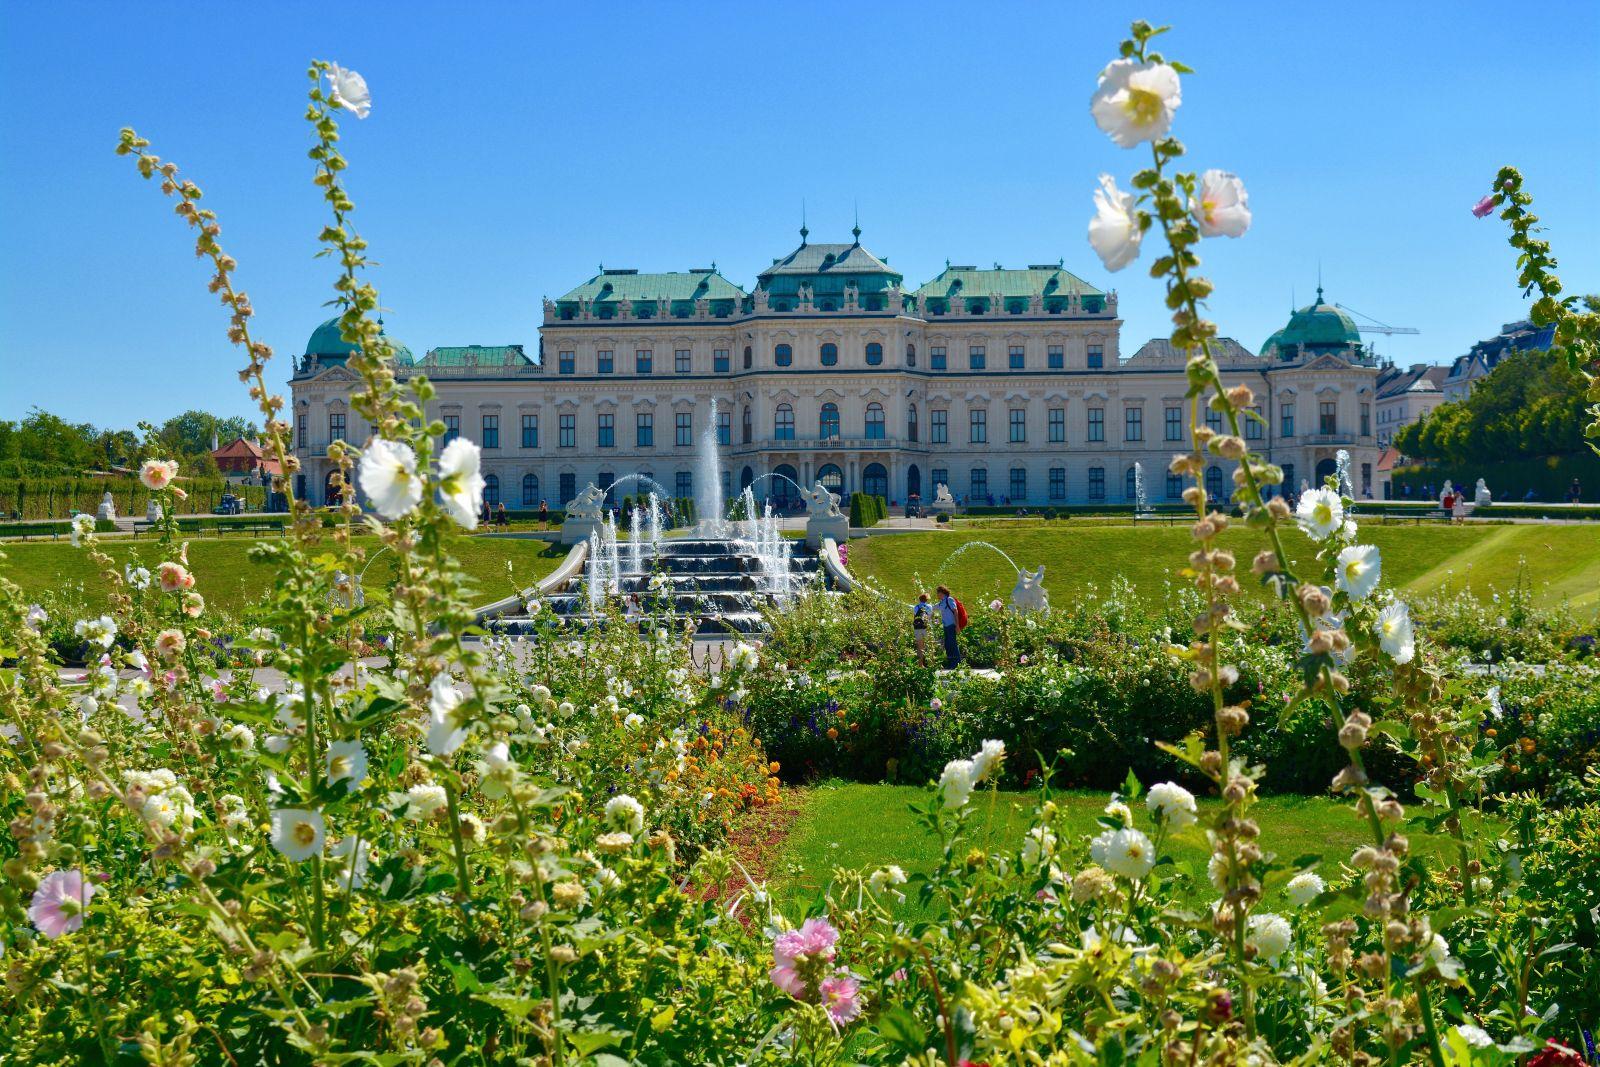 exterior-flowers-belvedere-palace-museum-vienna